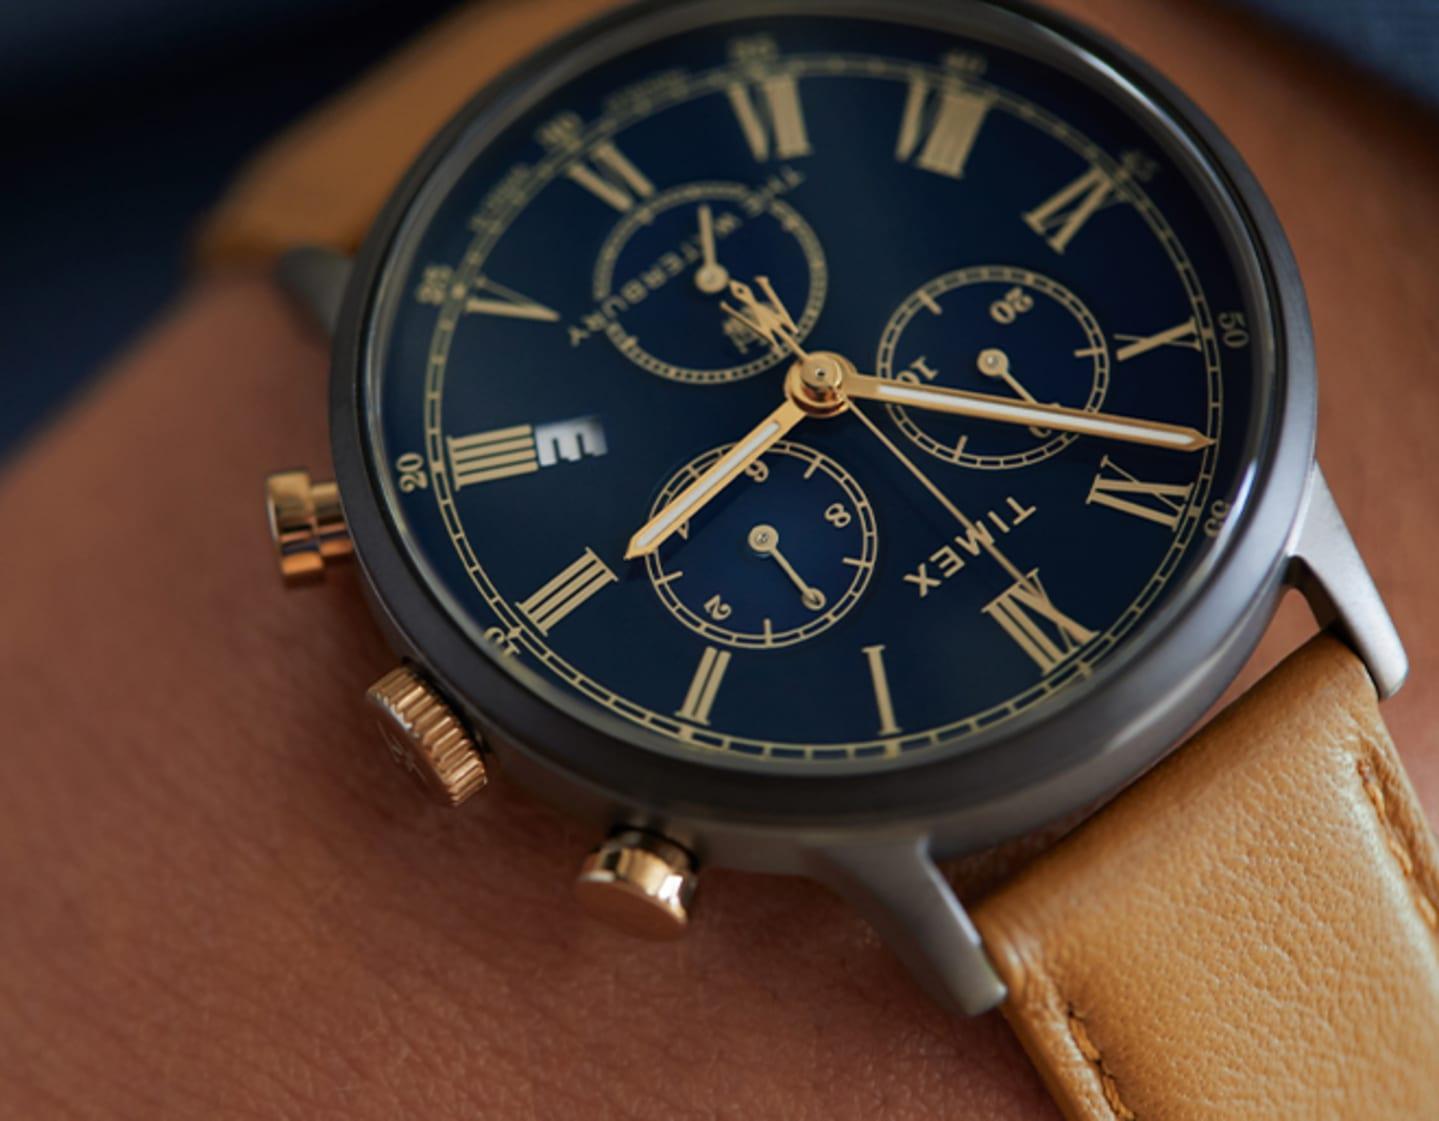 Waterbury Chrono Roman Numeral BLUE dial Watch.